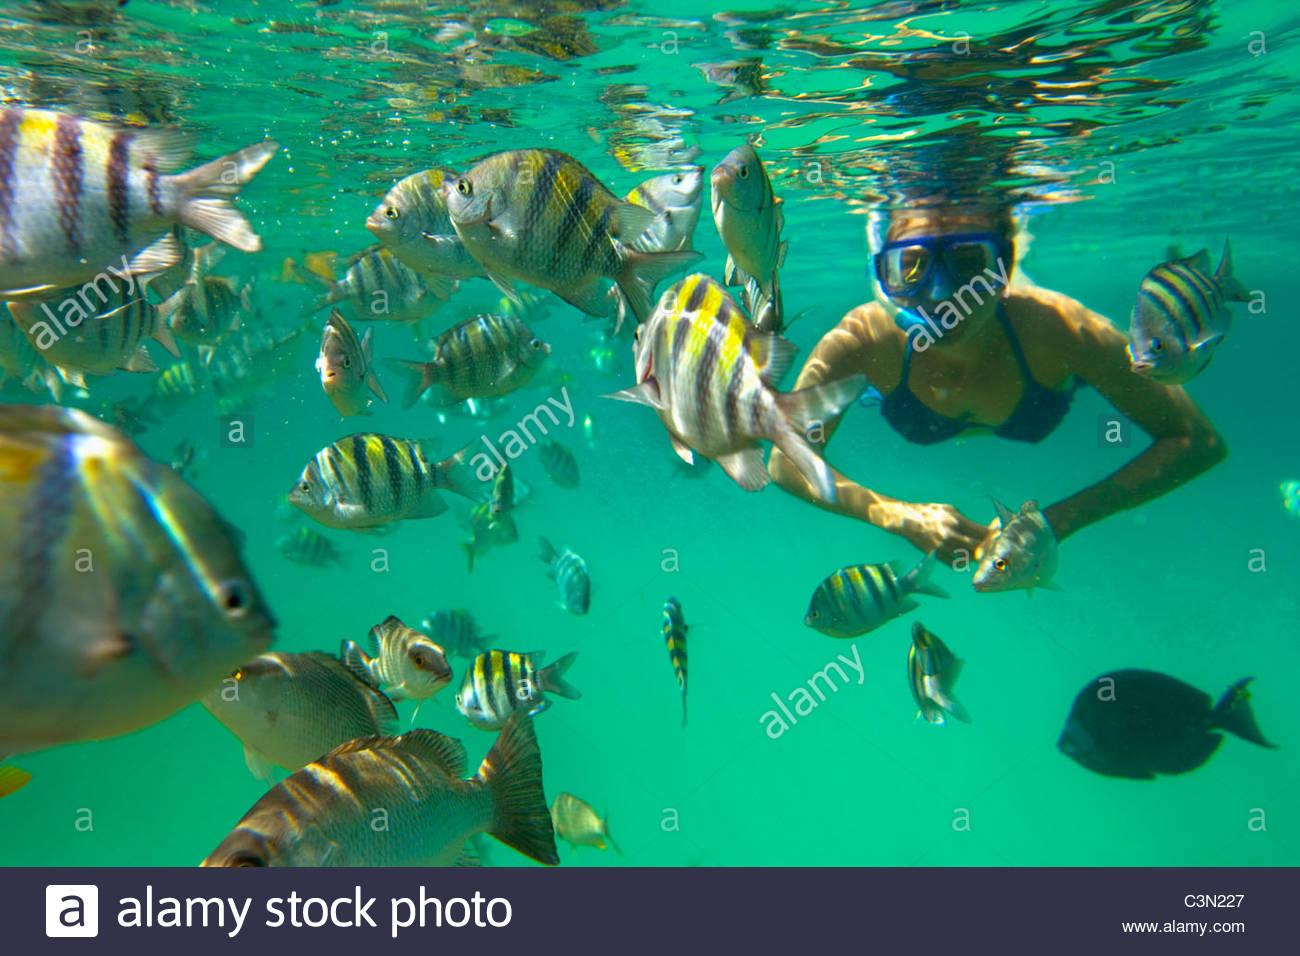 Mexiko, Quintana Roo, Xel-Ha Naturpark. Schnorcheln und Farbe Tourismus Tourist reisen Destinationfull Fisch. Stockbild